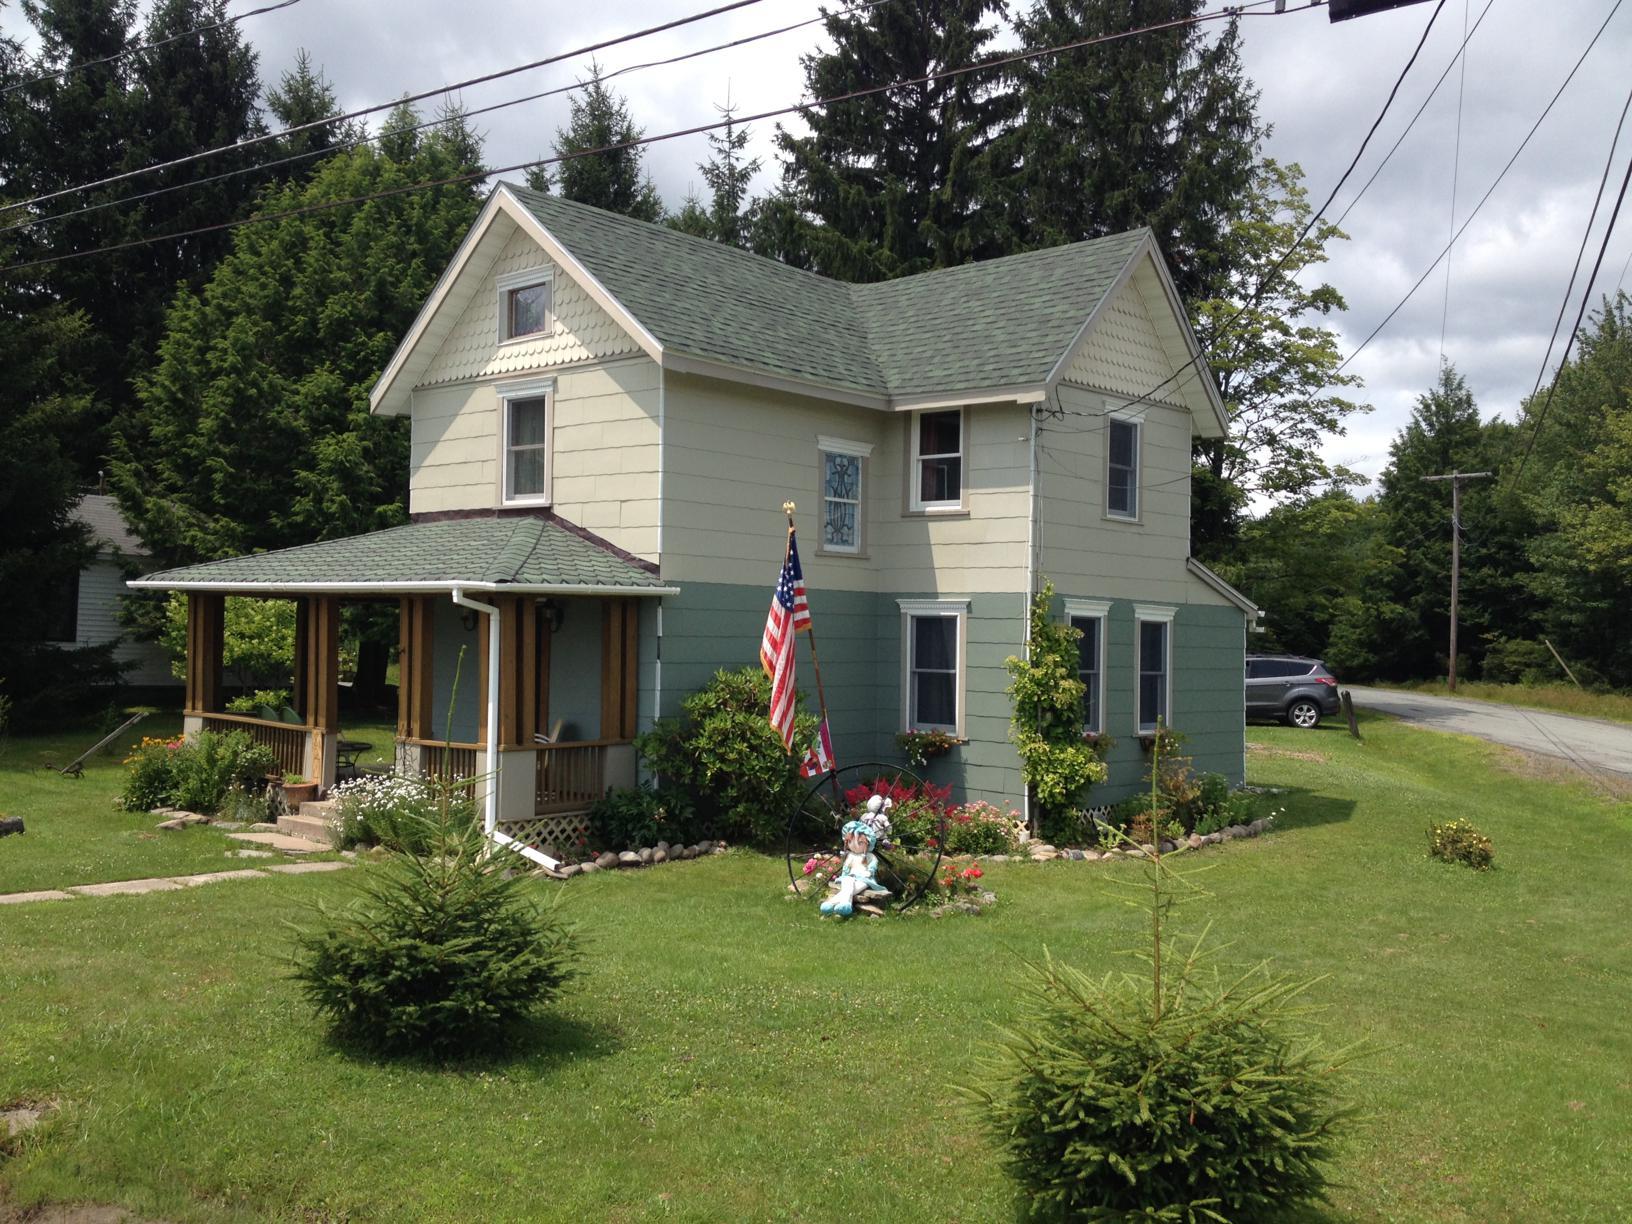 Sullivan County NY Real Estate image 2